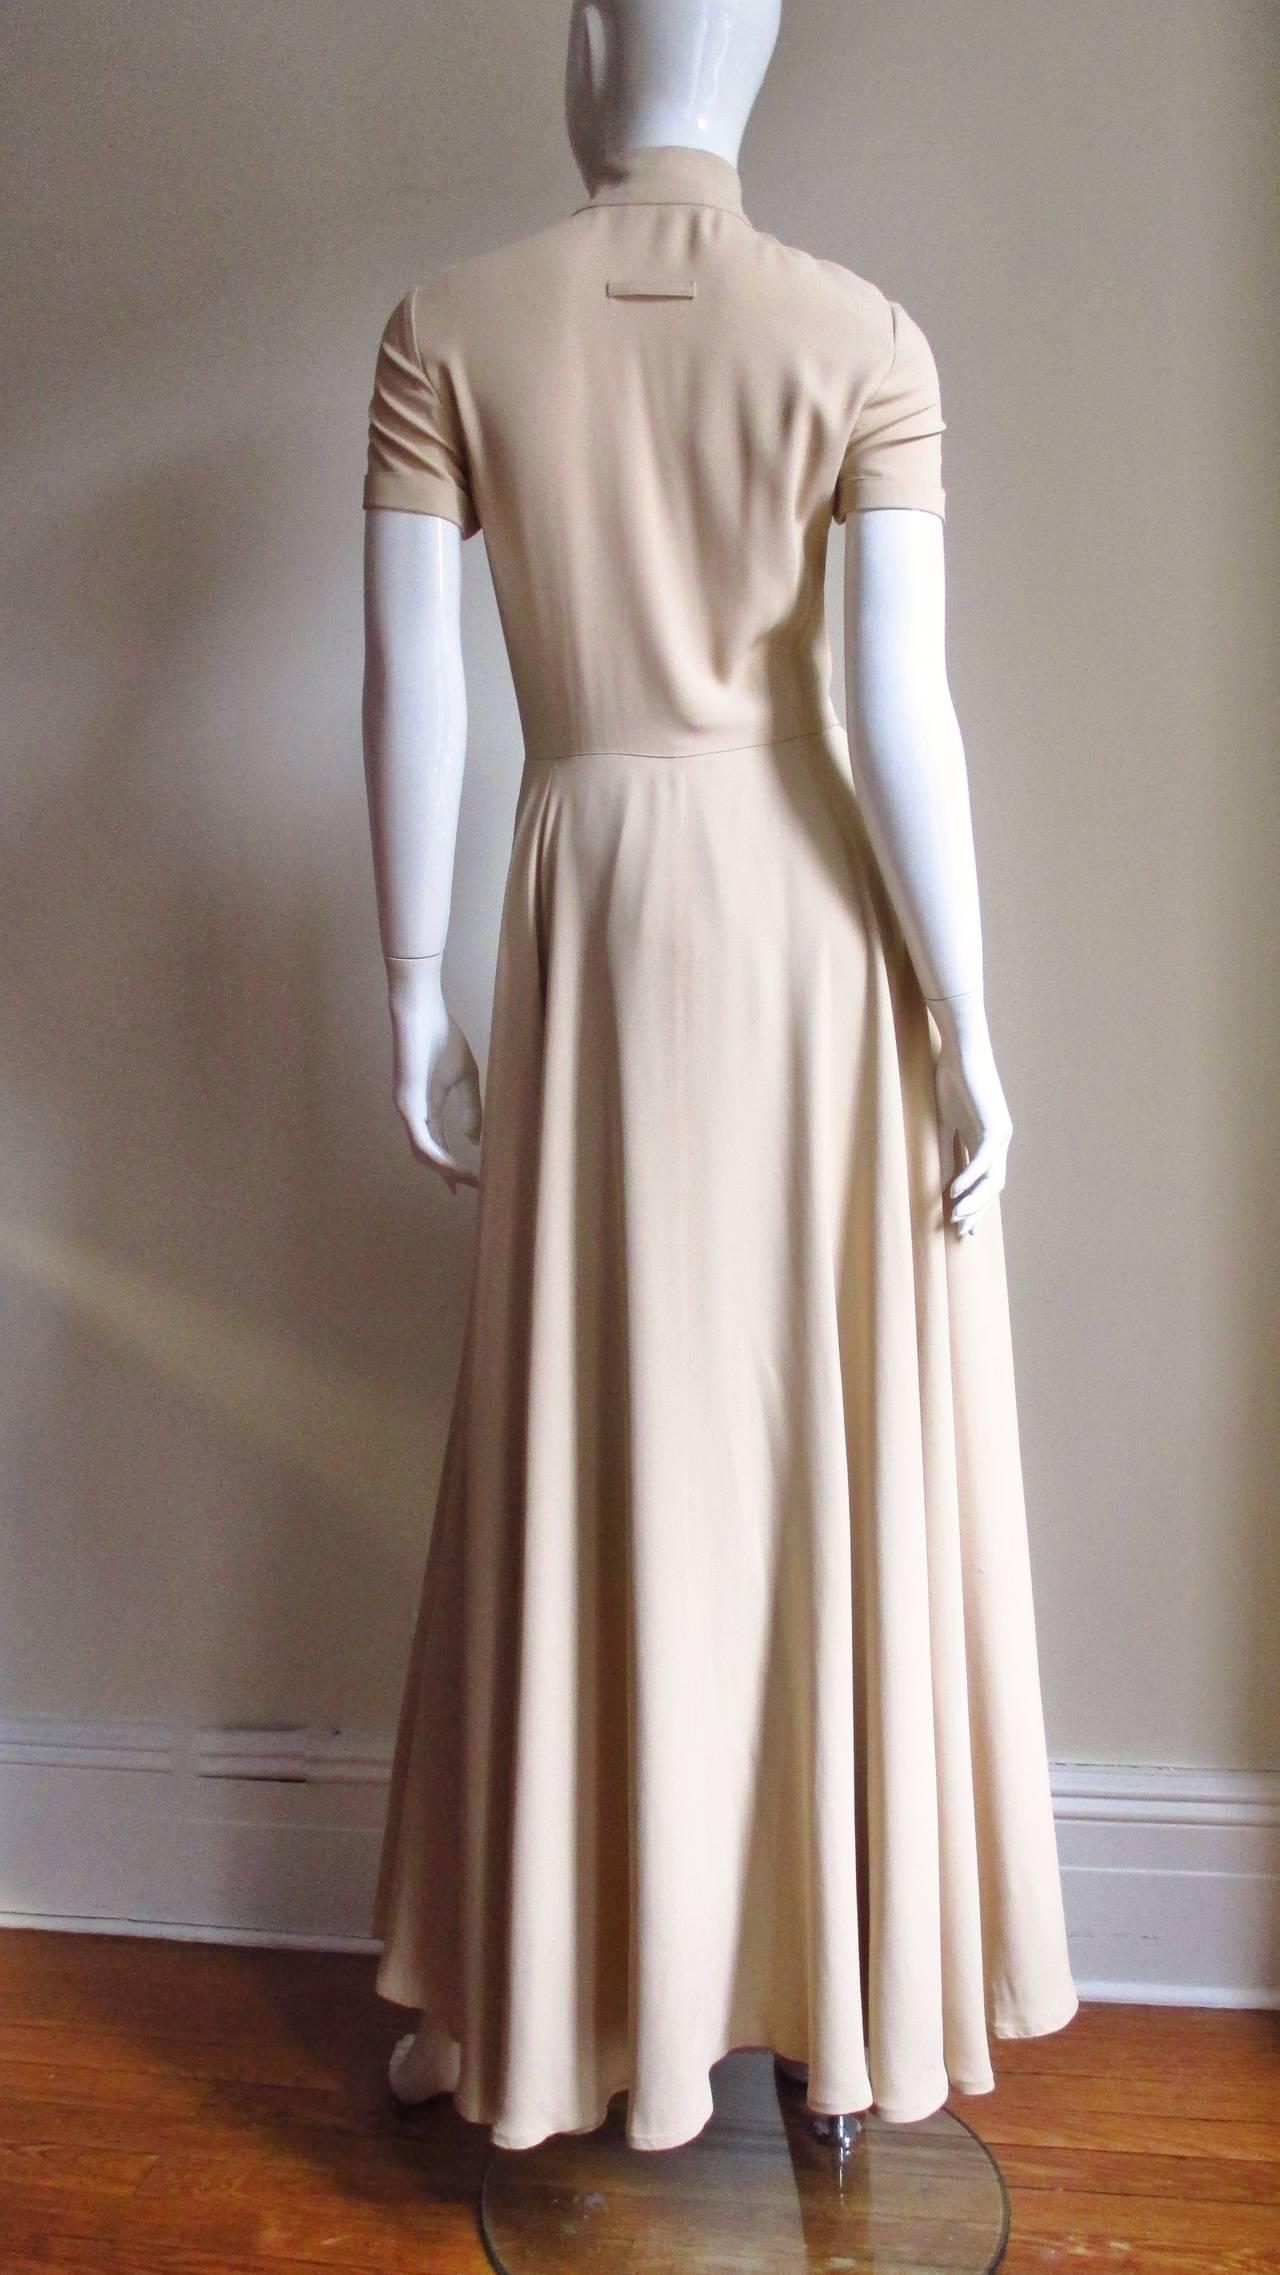 Vintage Gaultier Open Front Overdress 8